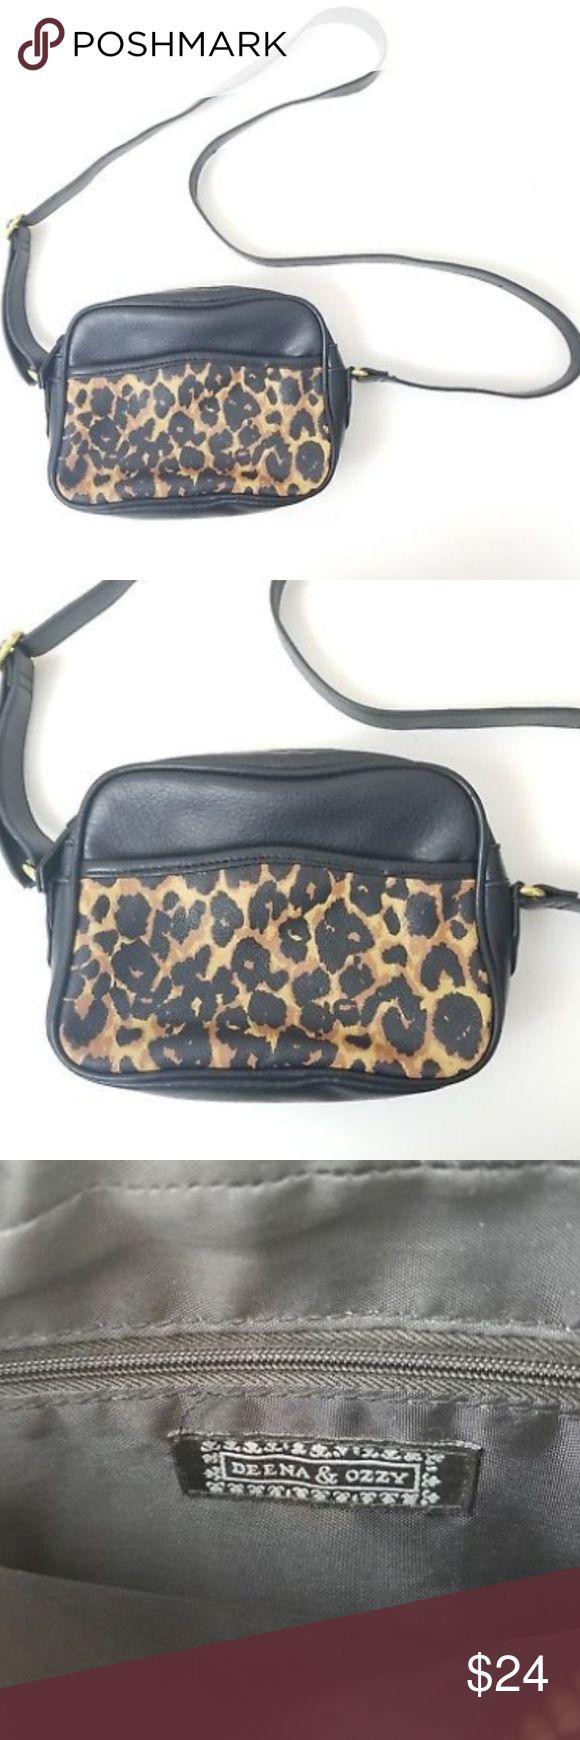 Urban Outfitter's DEENA & OZZY Animal Shoulder BAG Urban Outfitter's DEENA & OZZY Animal Shoulder BAG   Adjustable Strap   Black  Zip around   EUC Deena & Ozzy Bags Crossbody Bags